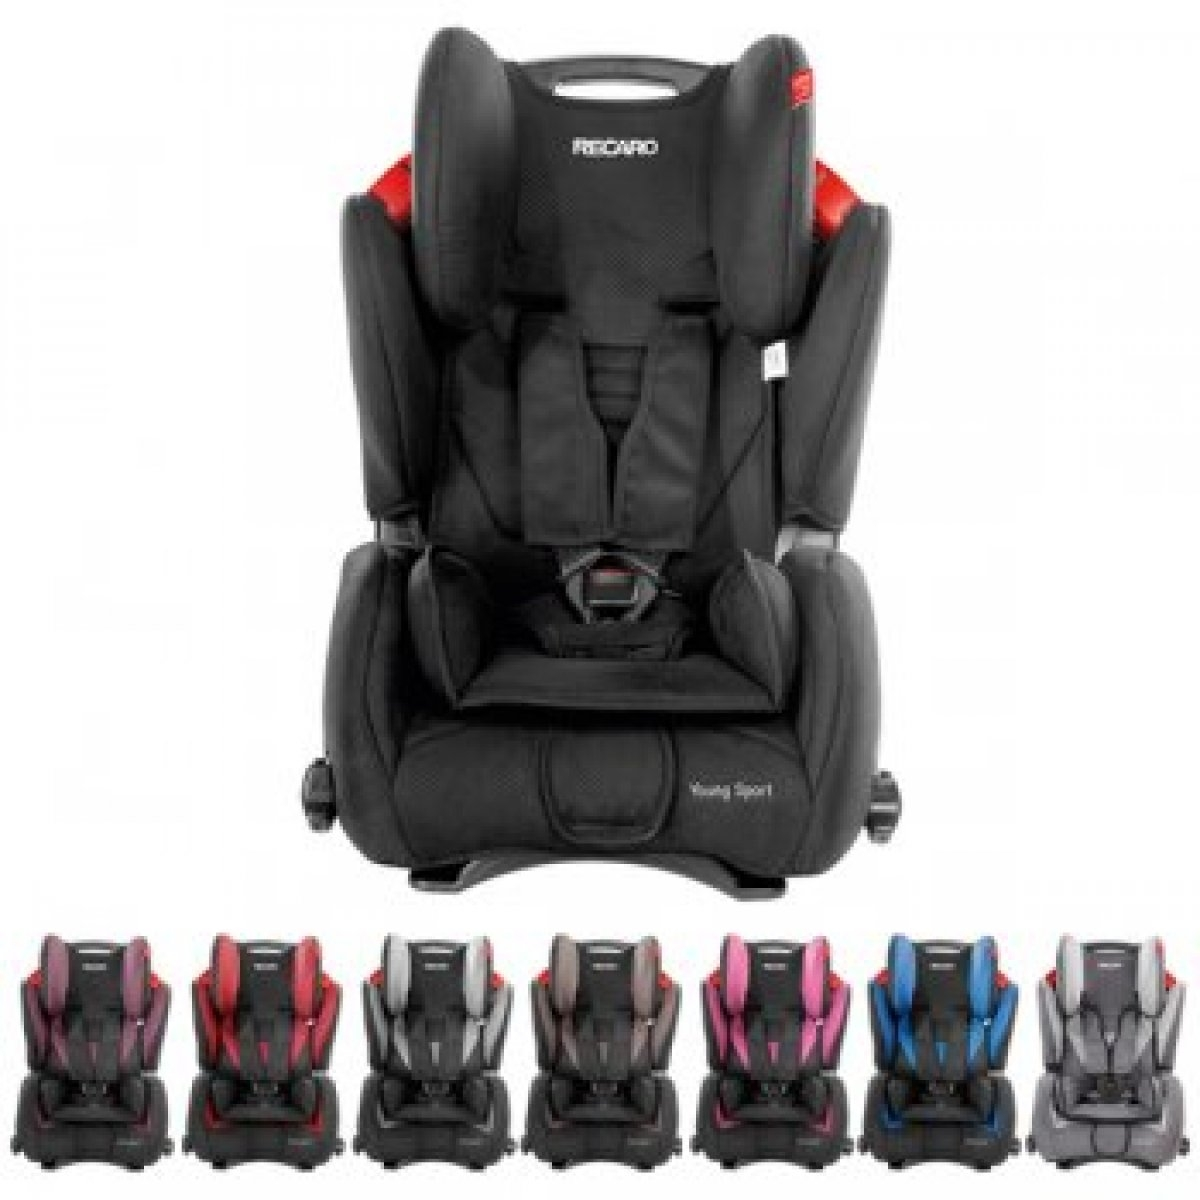 Recaro Car Seat Protector Seat Cover 2 In 1 Ebay